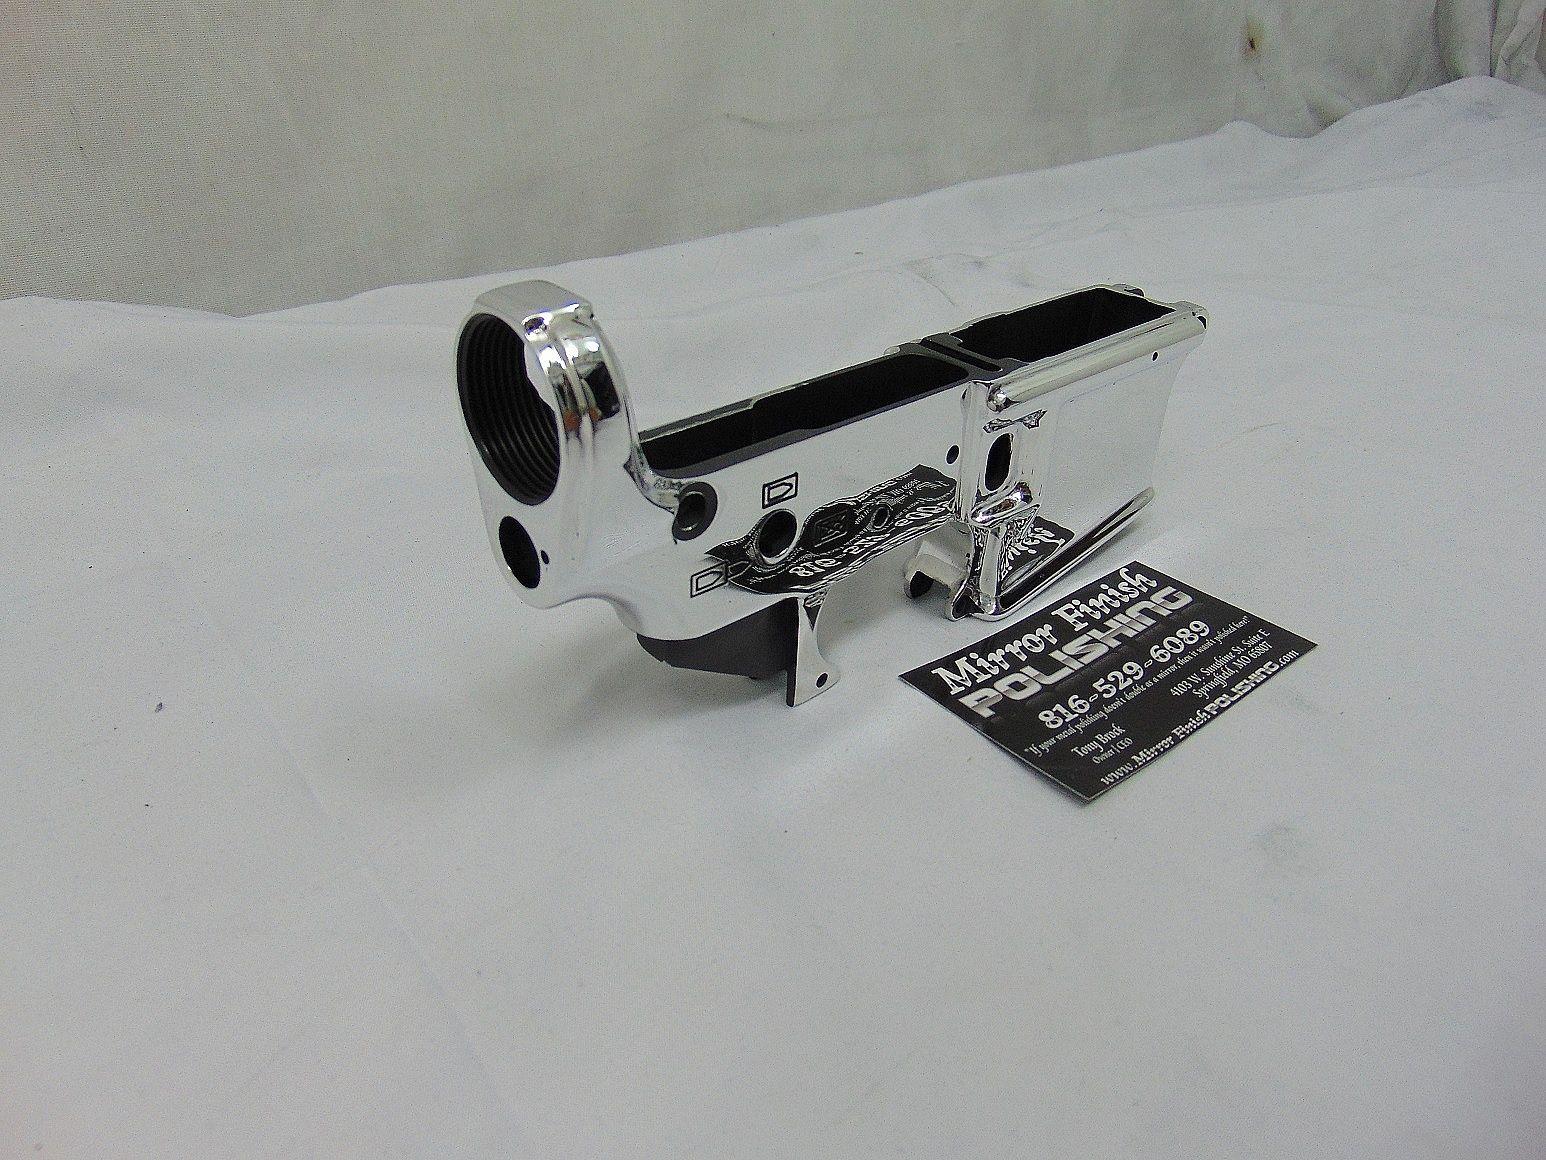 Aluminum AR-15 Lower Receiver AFTER Aluminum Polishing - Gun